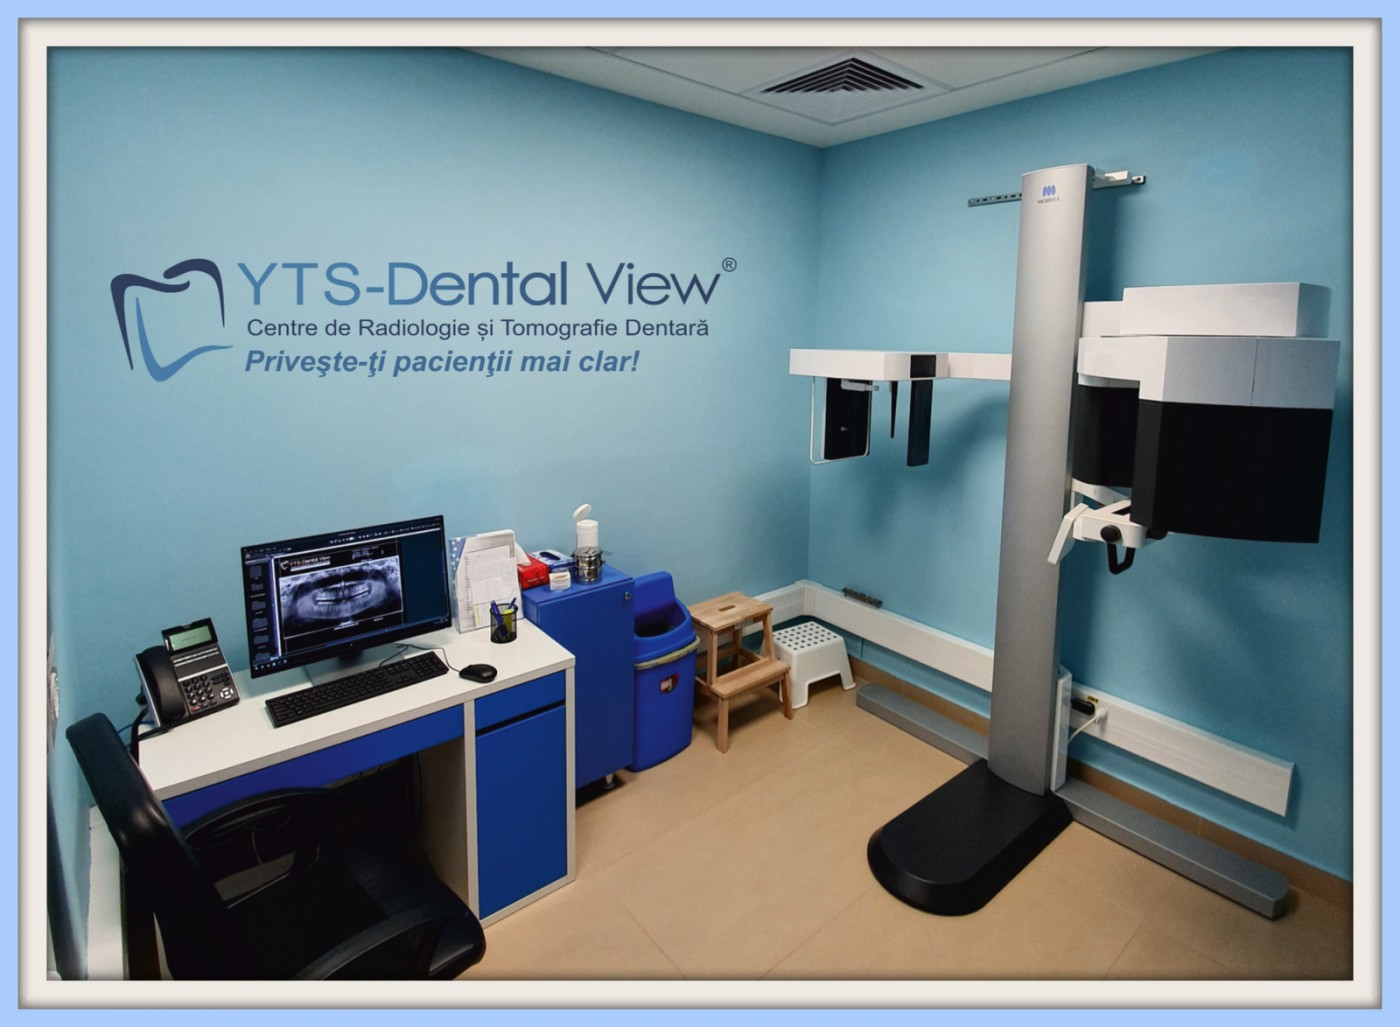 Radiologie dentară digitală în sectorul 5 - YTS-Dental View